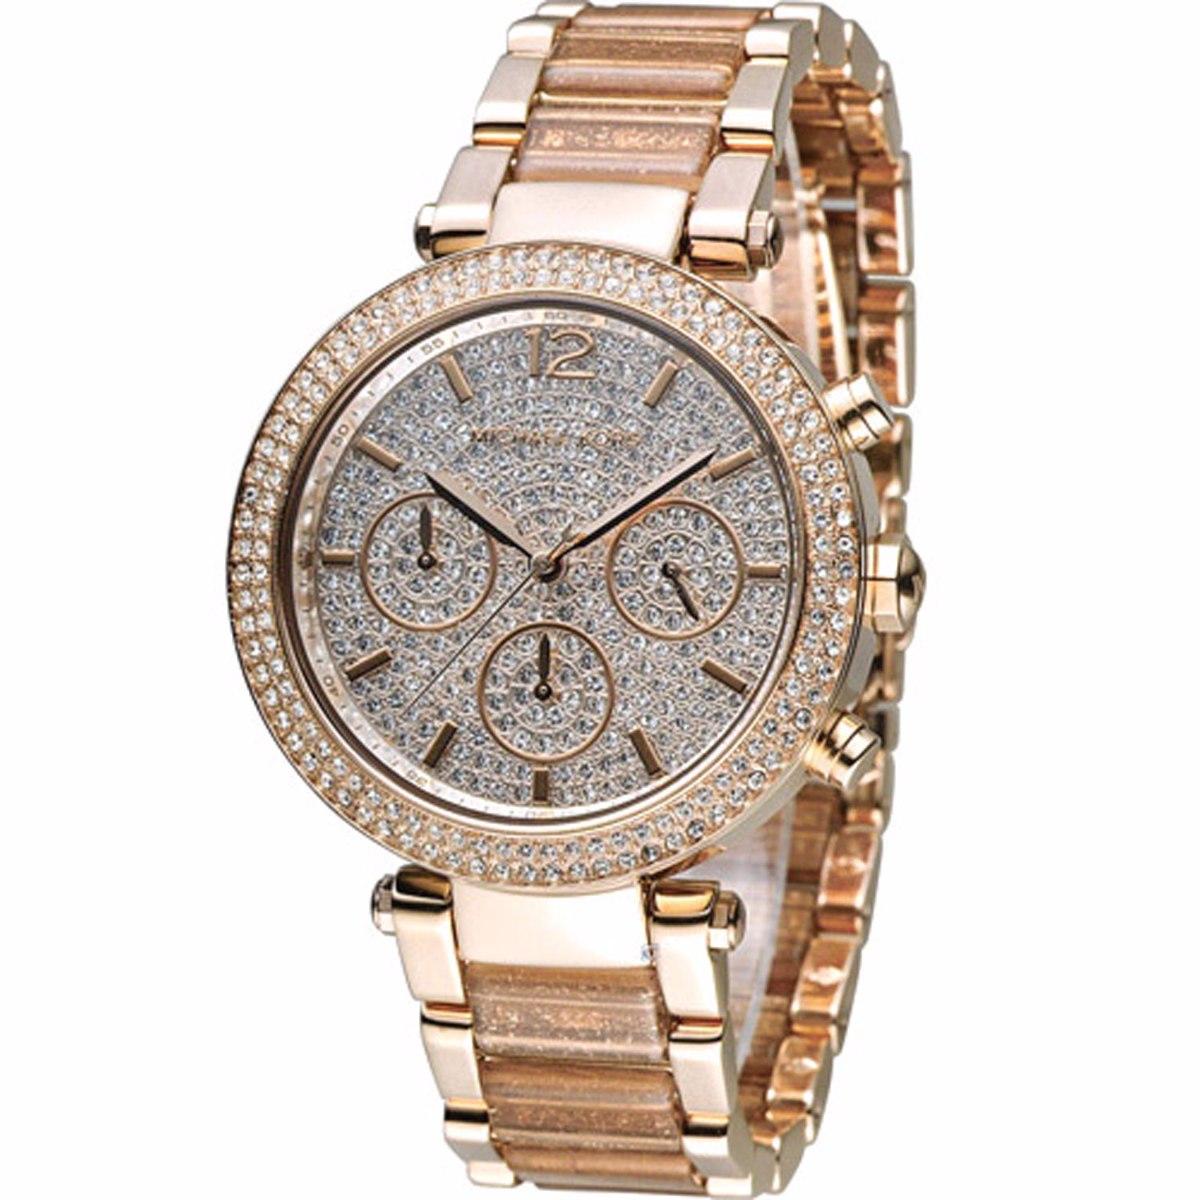 f6be2c6e9094 Reloj Dama Michael Kors Mk6285 Agen Ofi Envio Gratis -   22.444